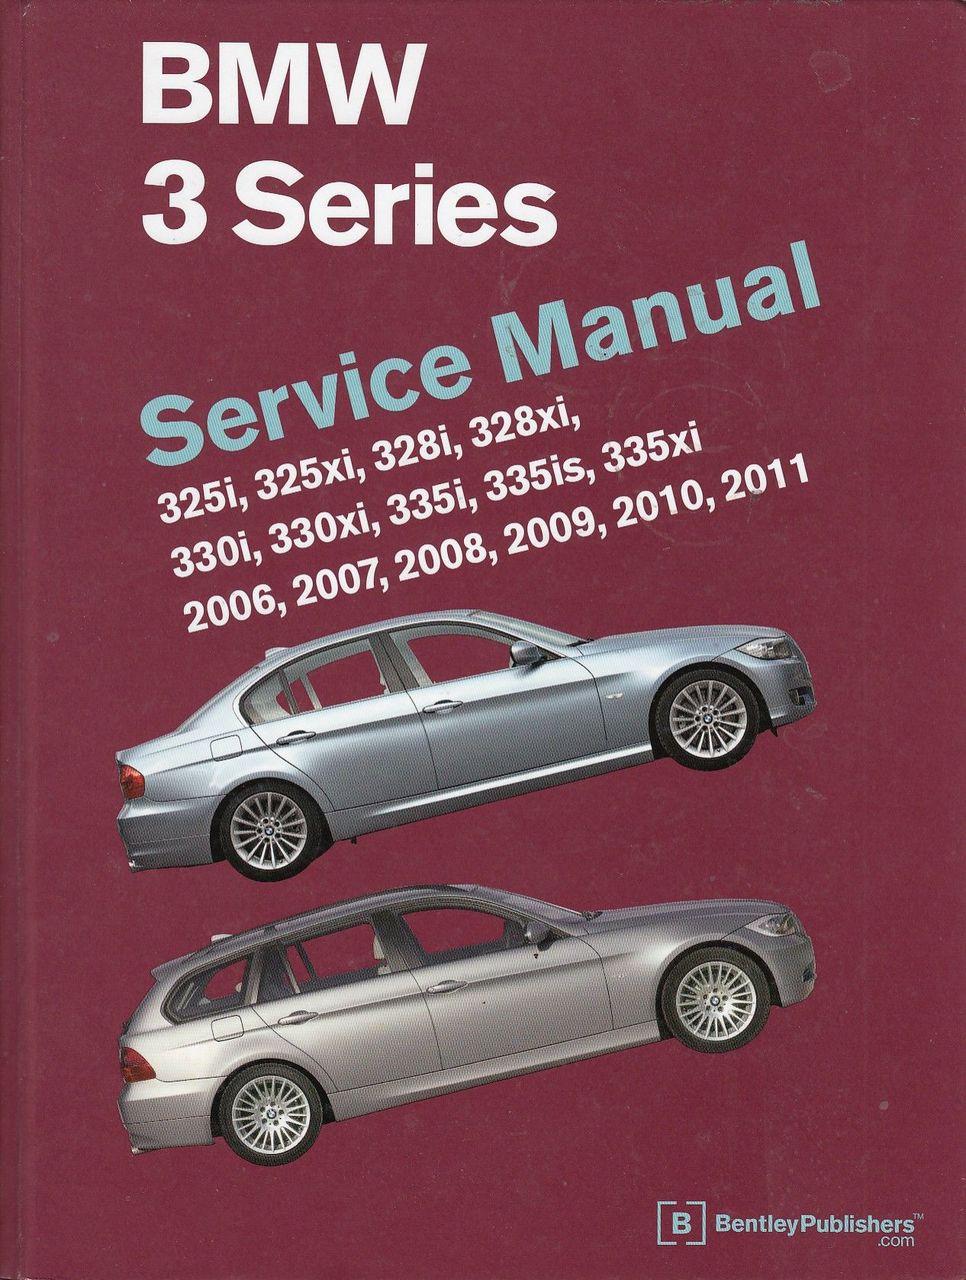 bmw 3 series e90 e91 e92 e93 2006 2011 workshop manual rh automotobookshop com au 2006 bmw 330i service manual 2006 bmw 330i service manual